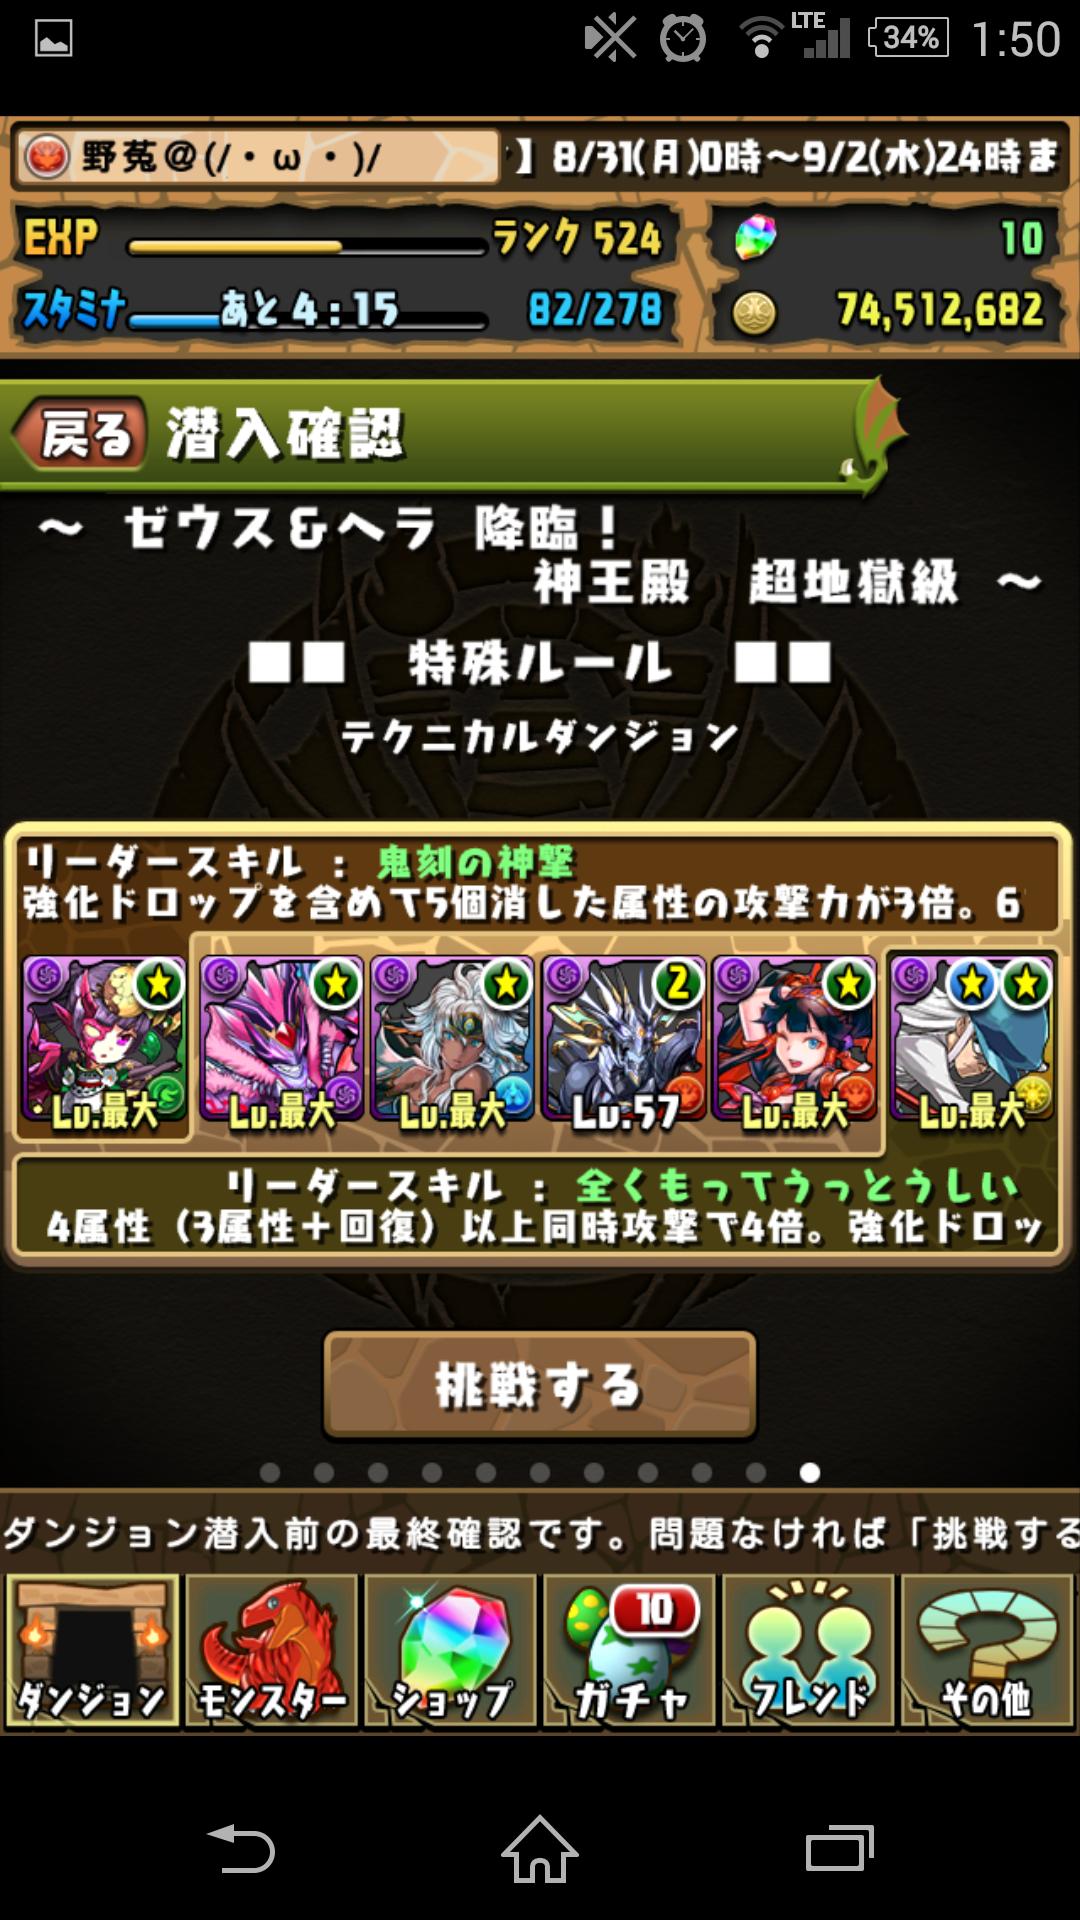 Screenshot_2015-09-01-01-50-08.png